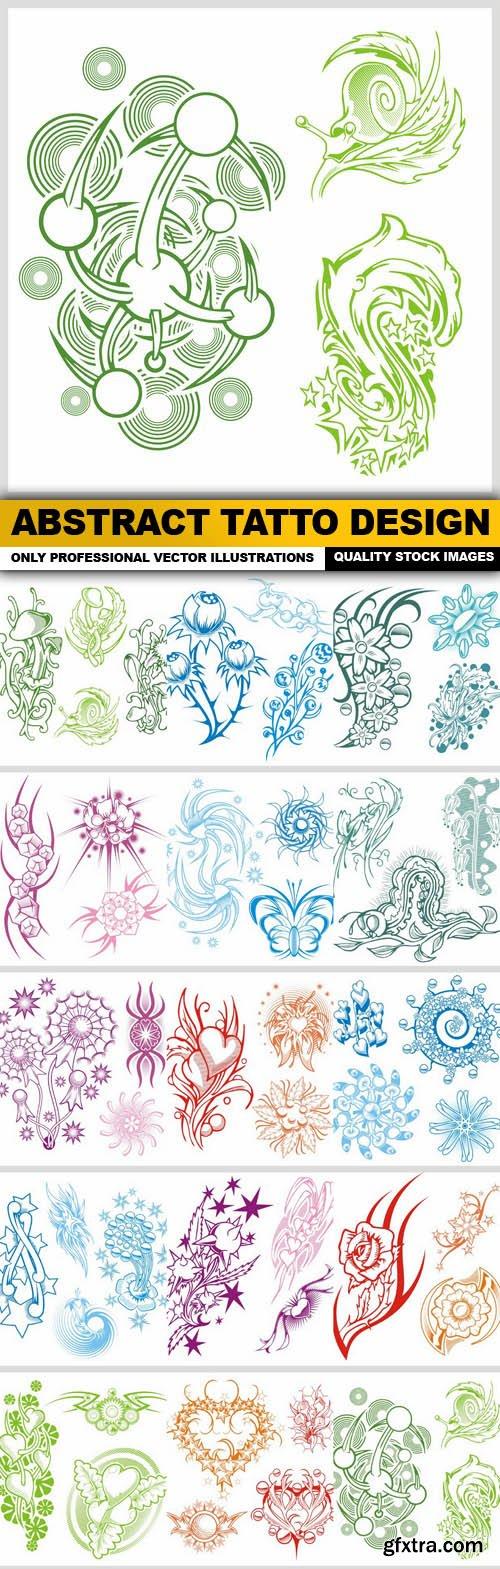 Abstract Tatto Design - 15 Vector